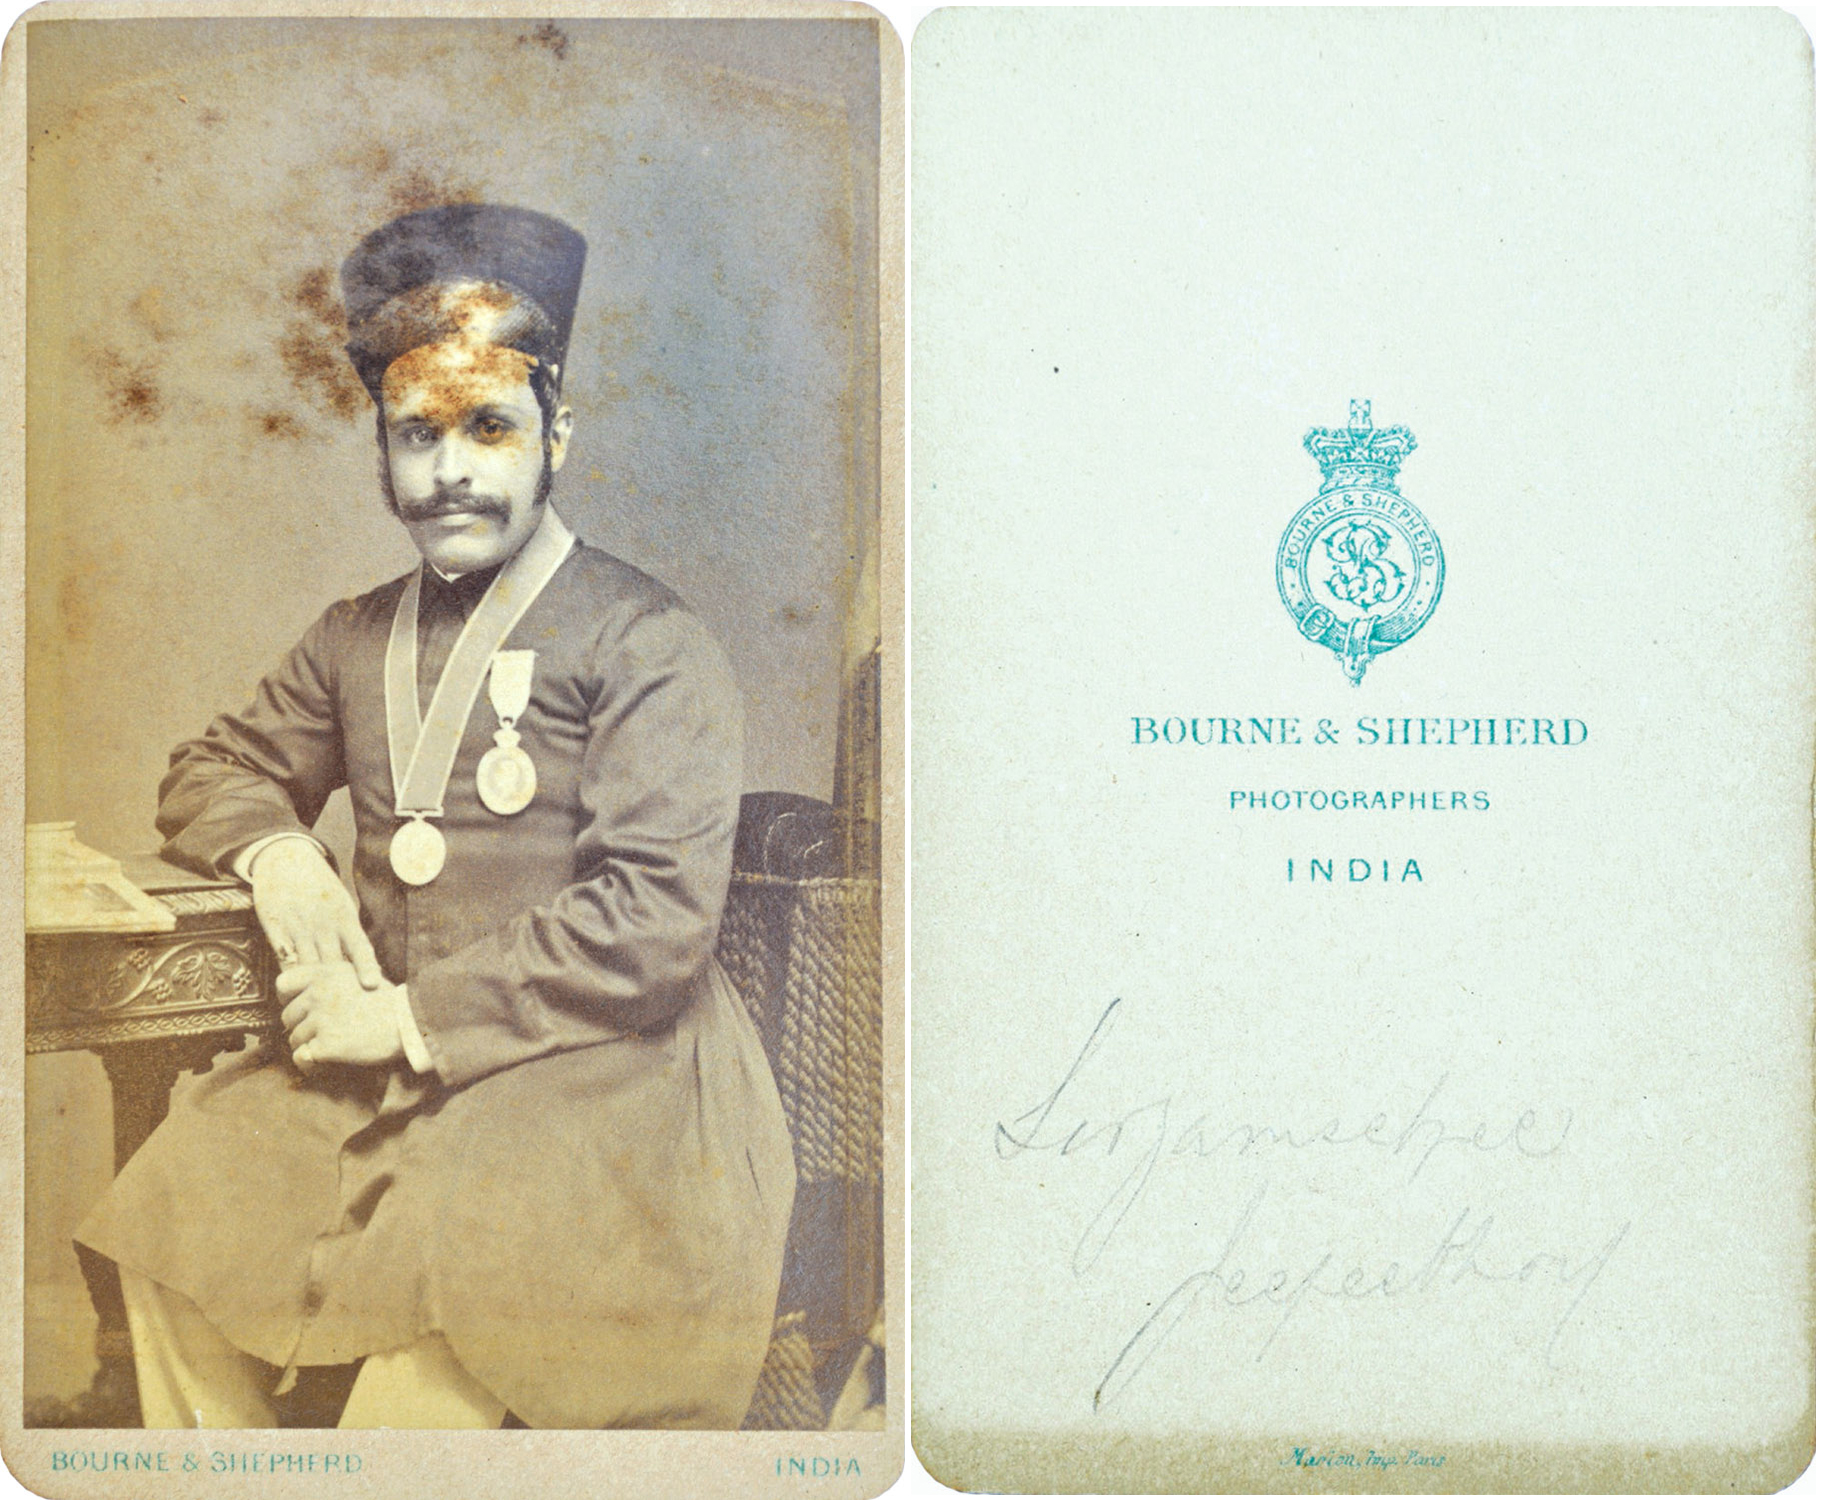 Sir Jamsetjee Jejeebhoy-3rd Baronet